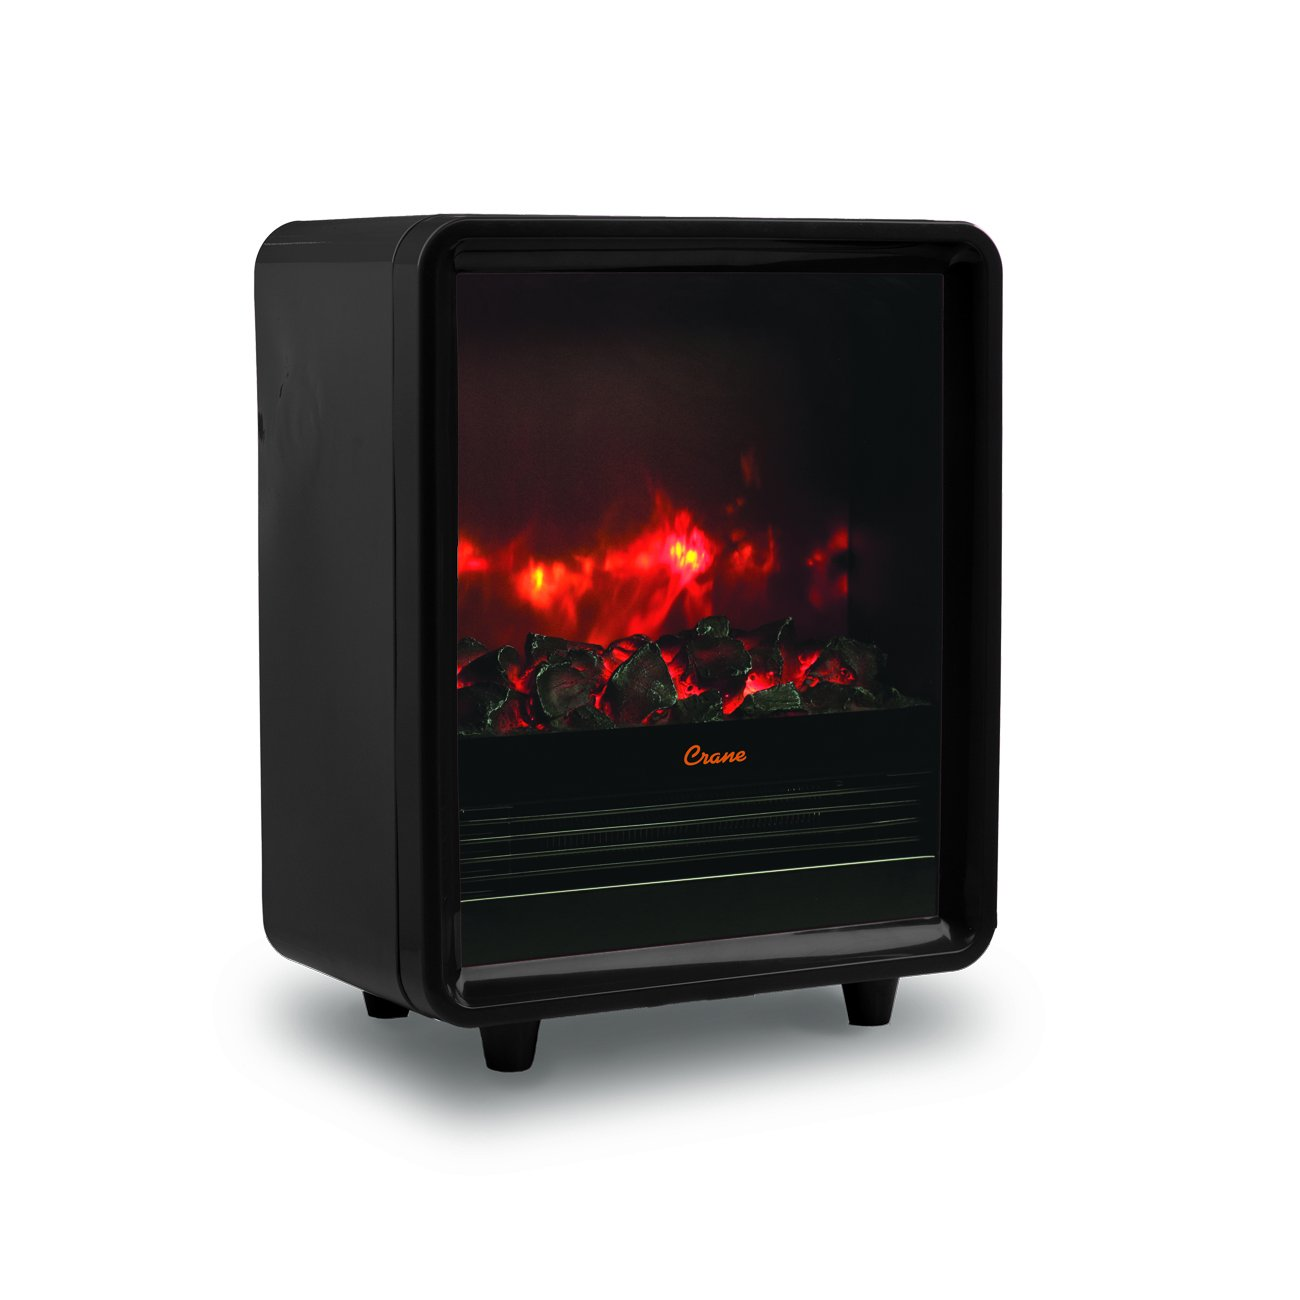 Crane Fireplace Heater - Black by Crane USA